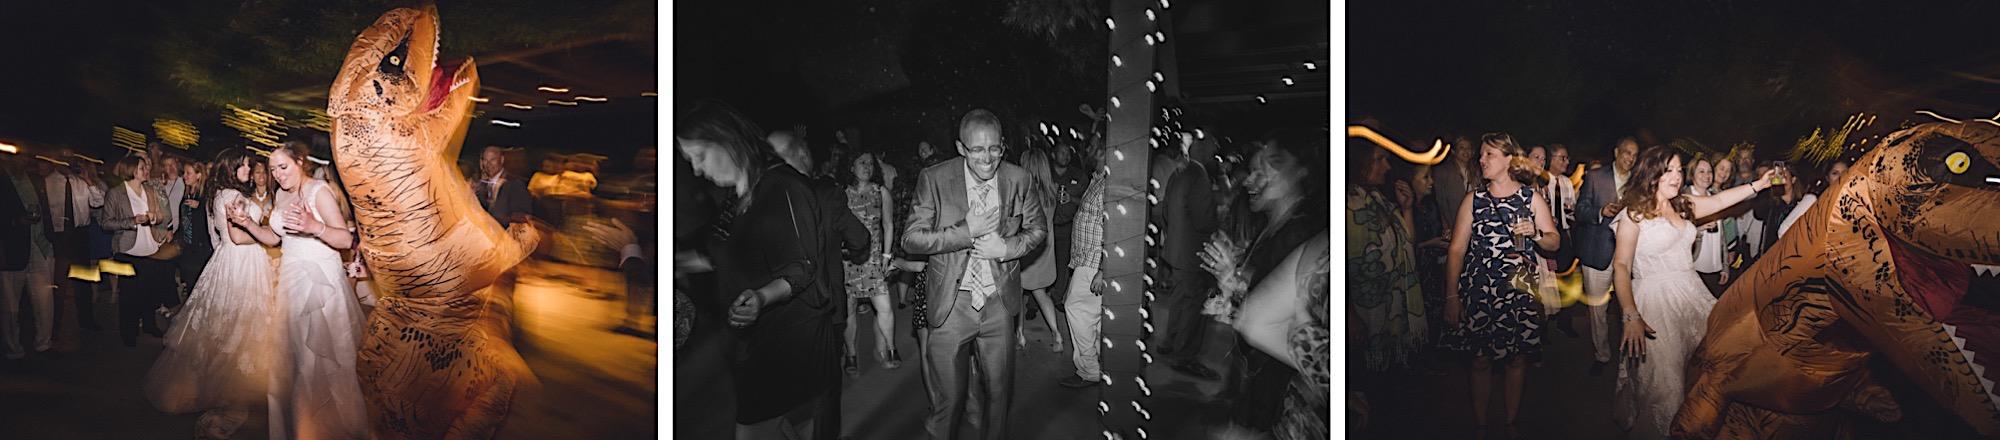 49_Napa_weddings.jpg